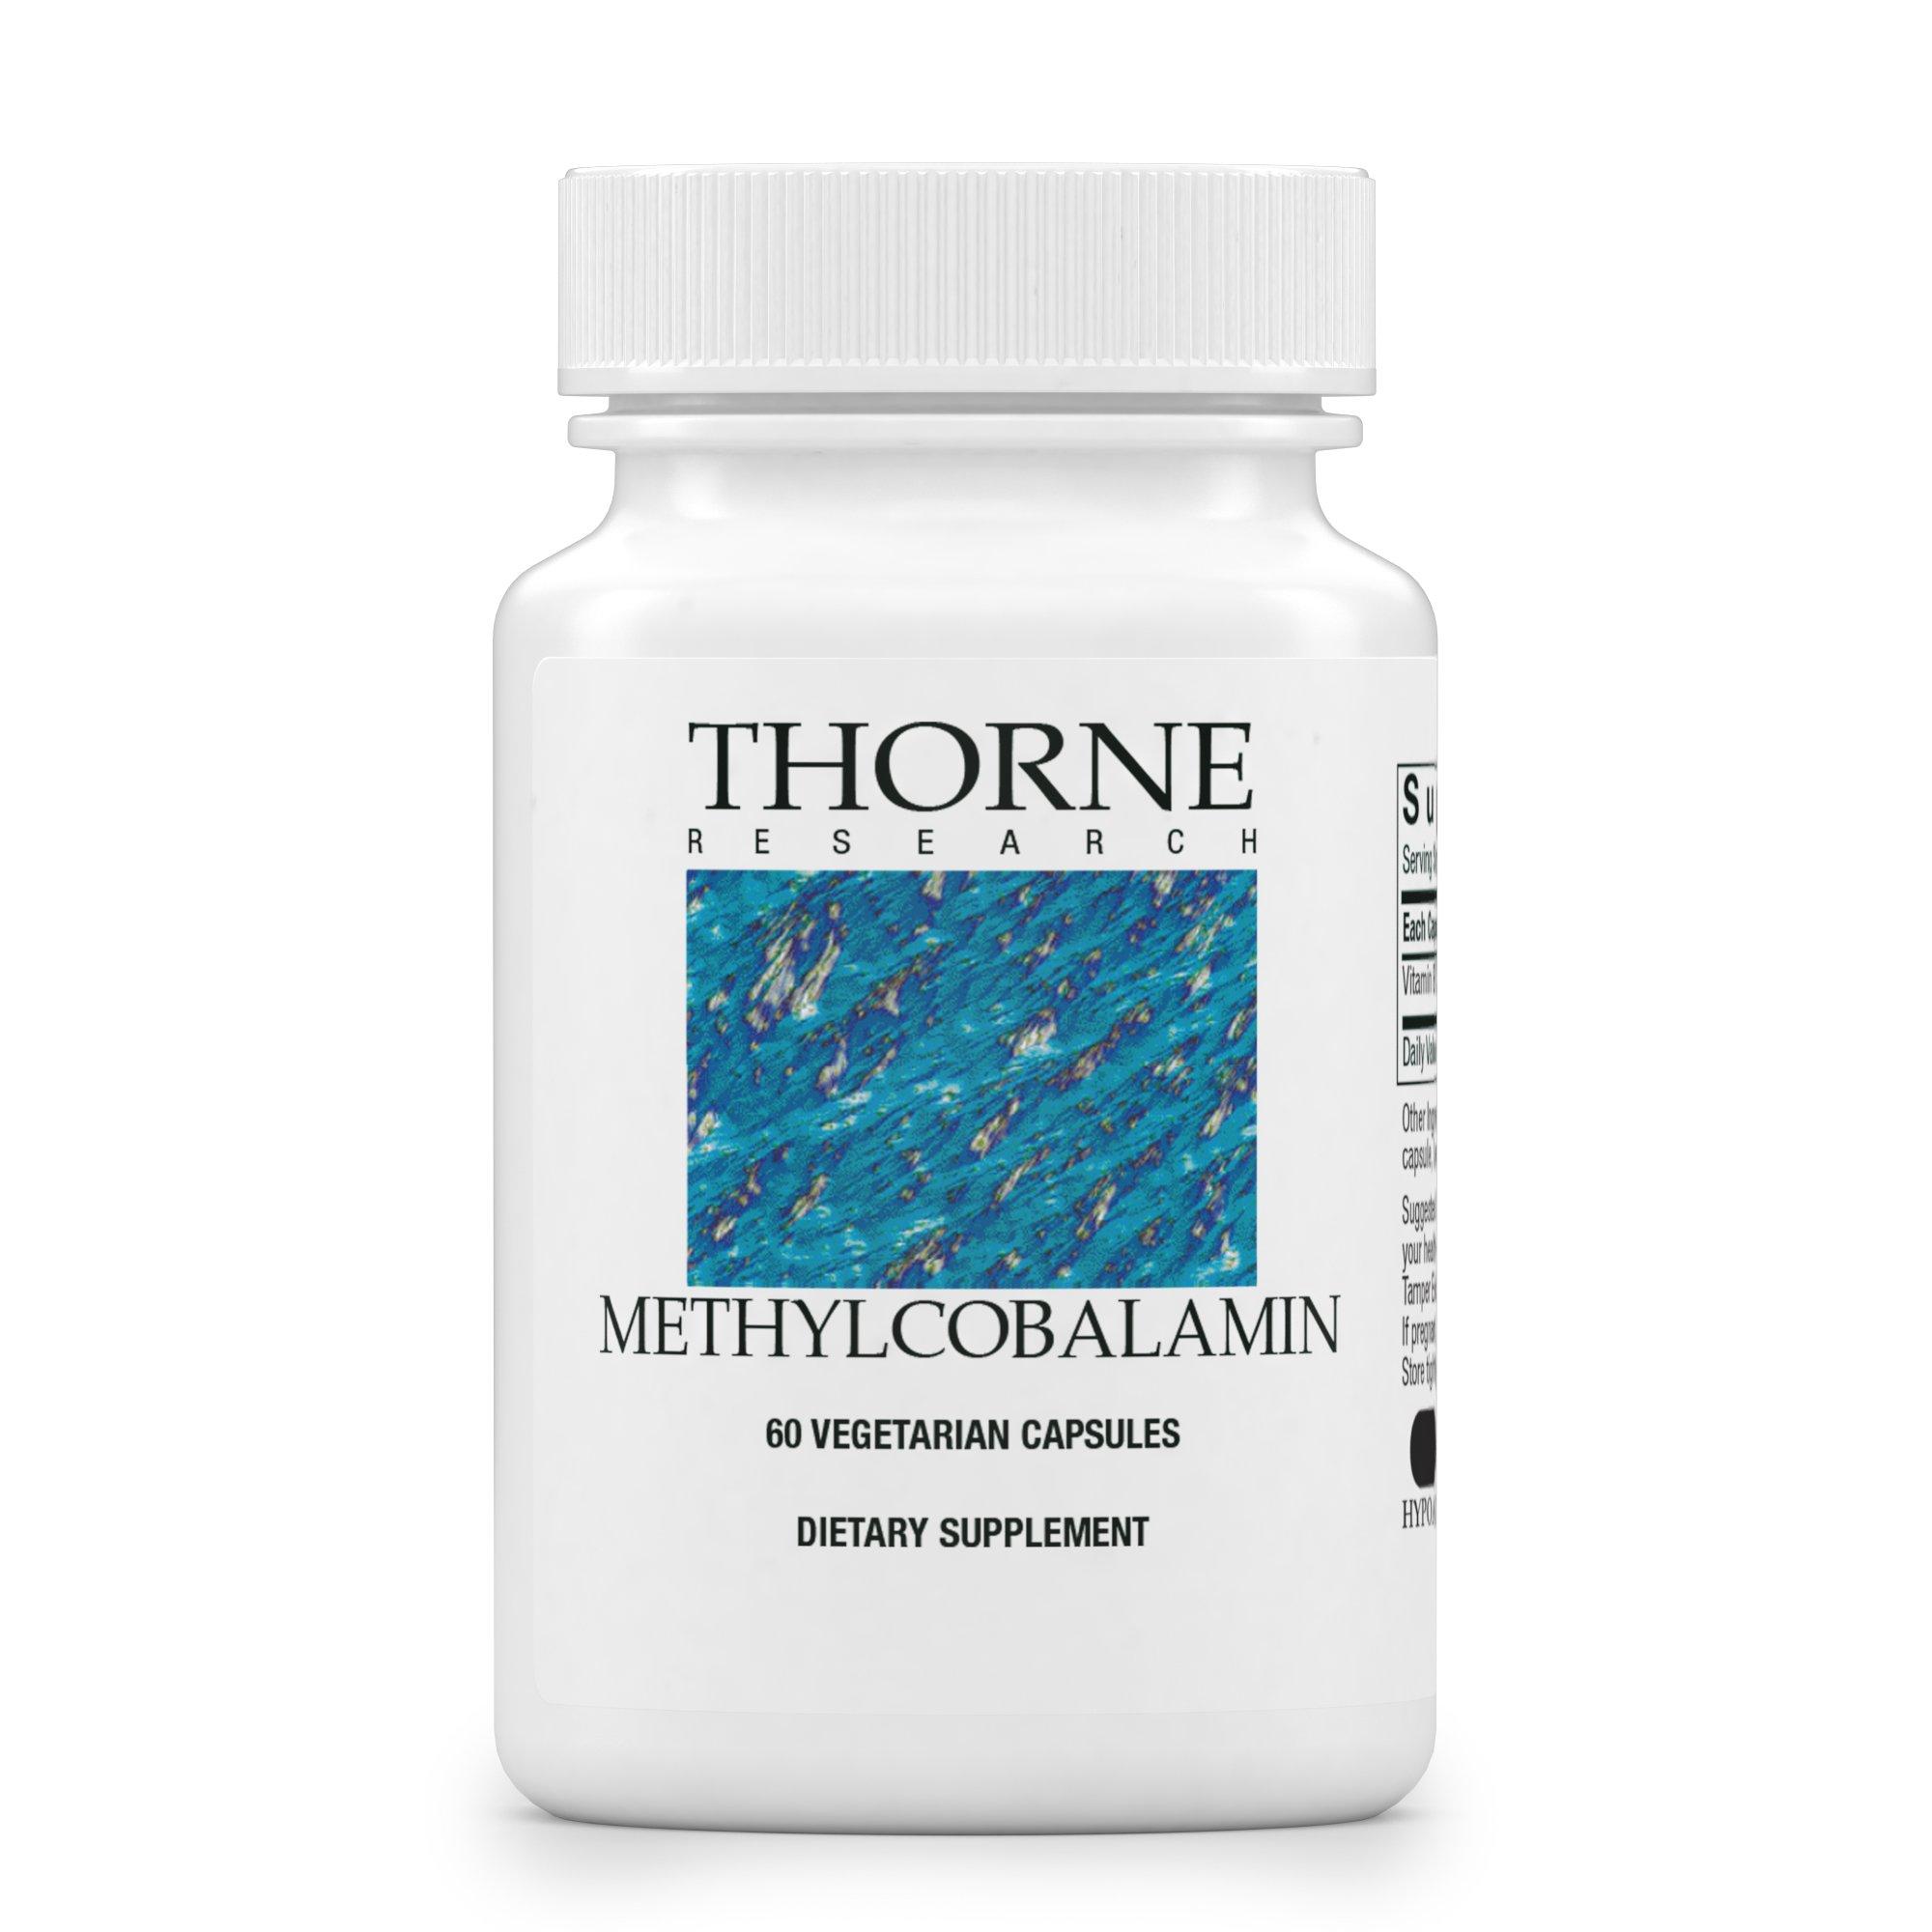 Thorne Research - Methylcobalamin (Methyl B12) - Active Form of Vitamin B12 - 60 Capsules